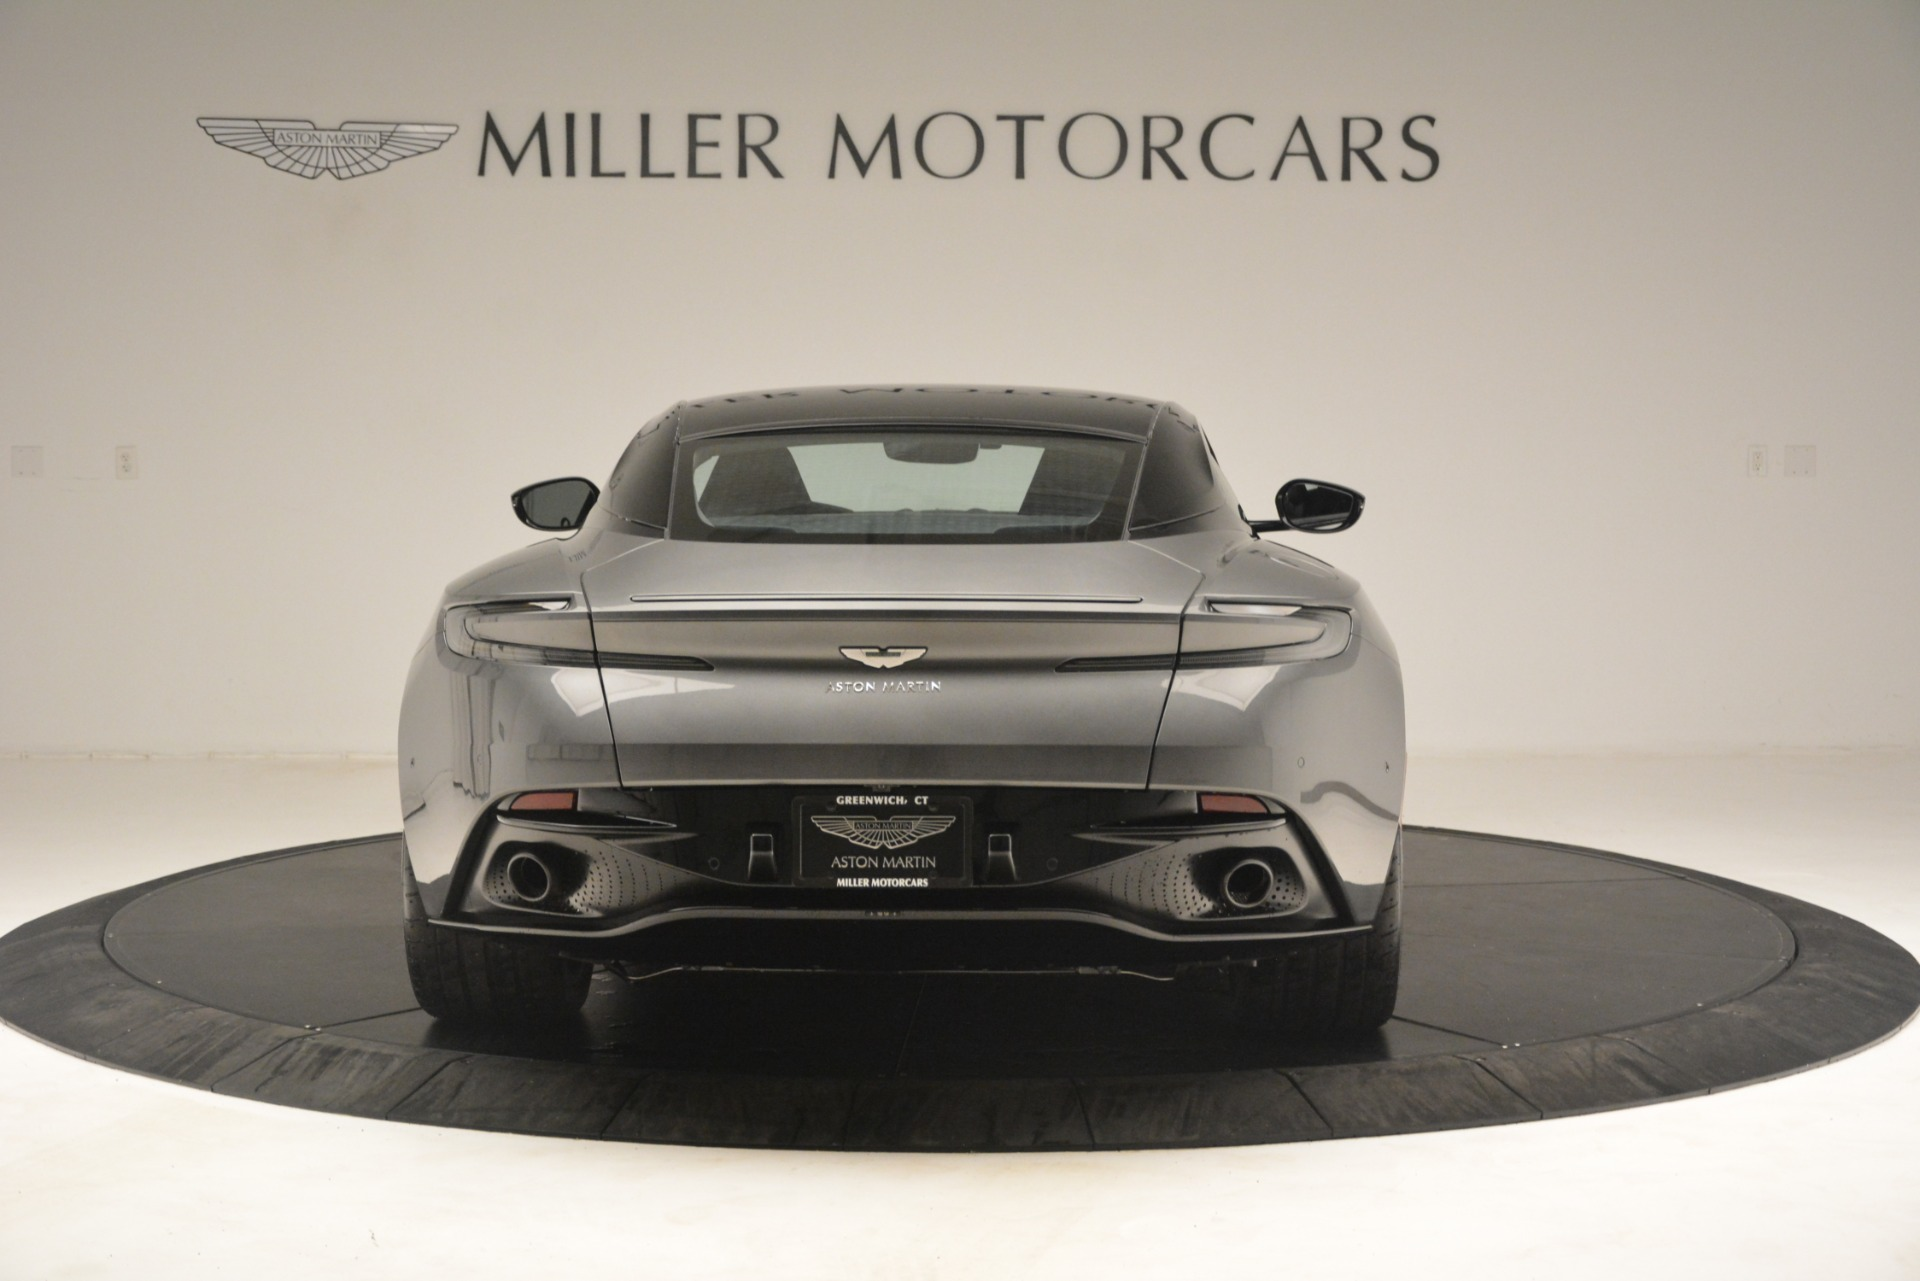 New 2019 Aston Martin DB11 V12 AMR Coupe